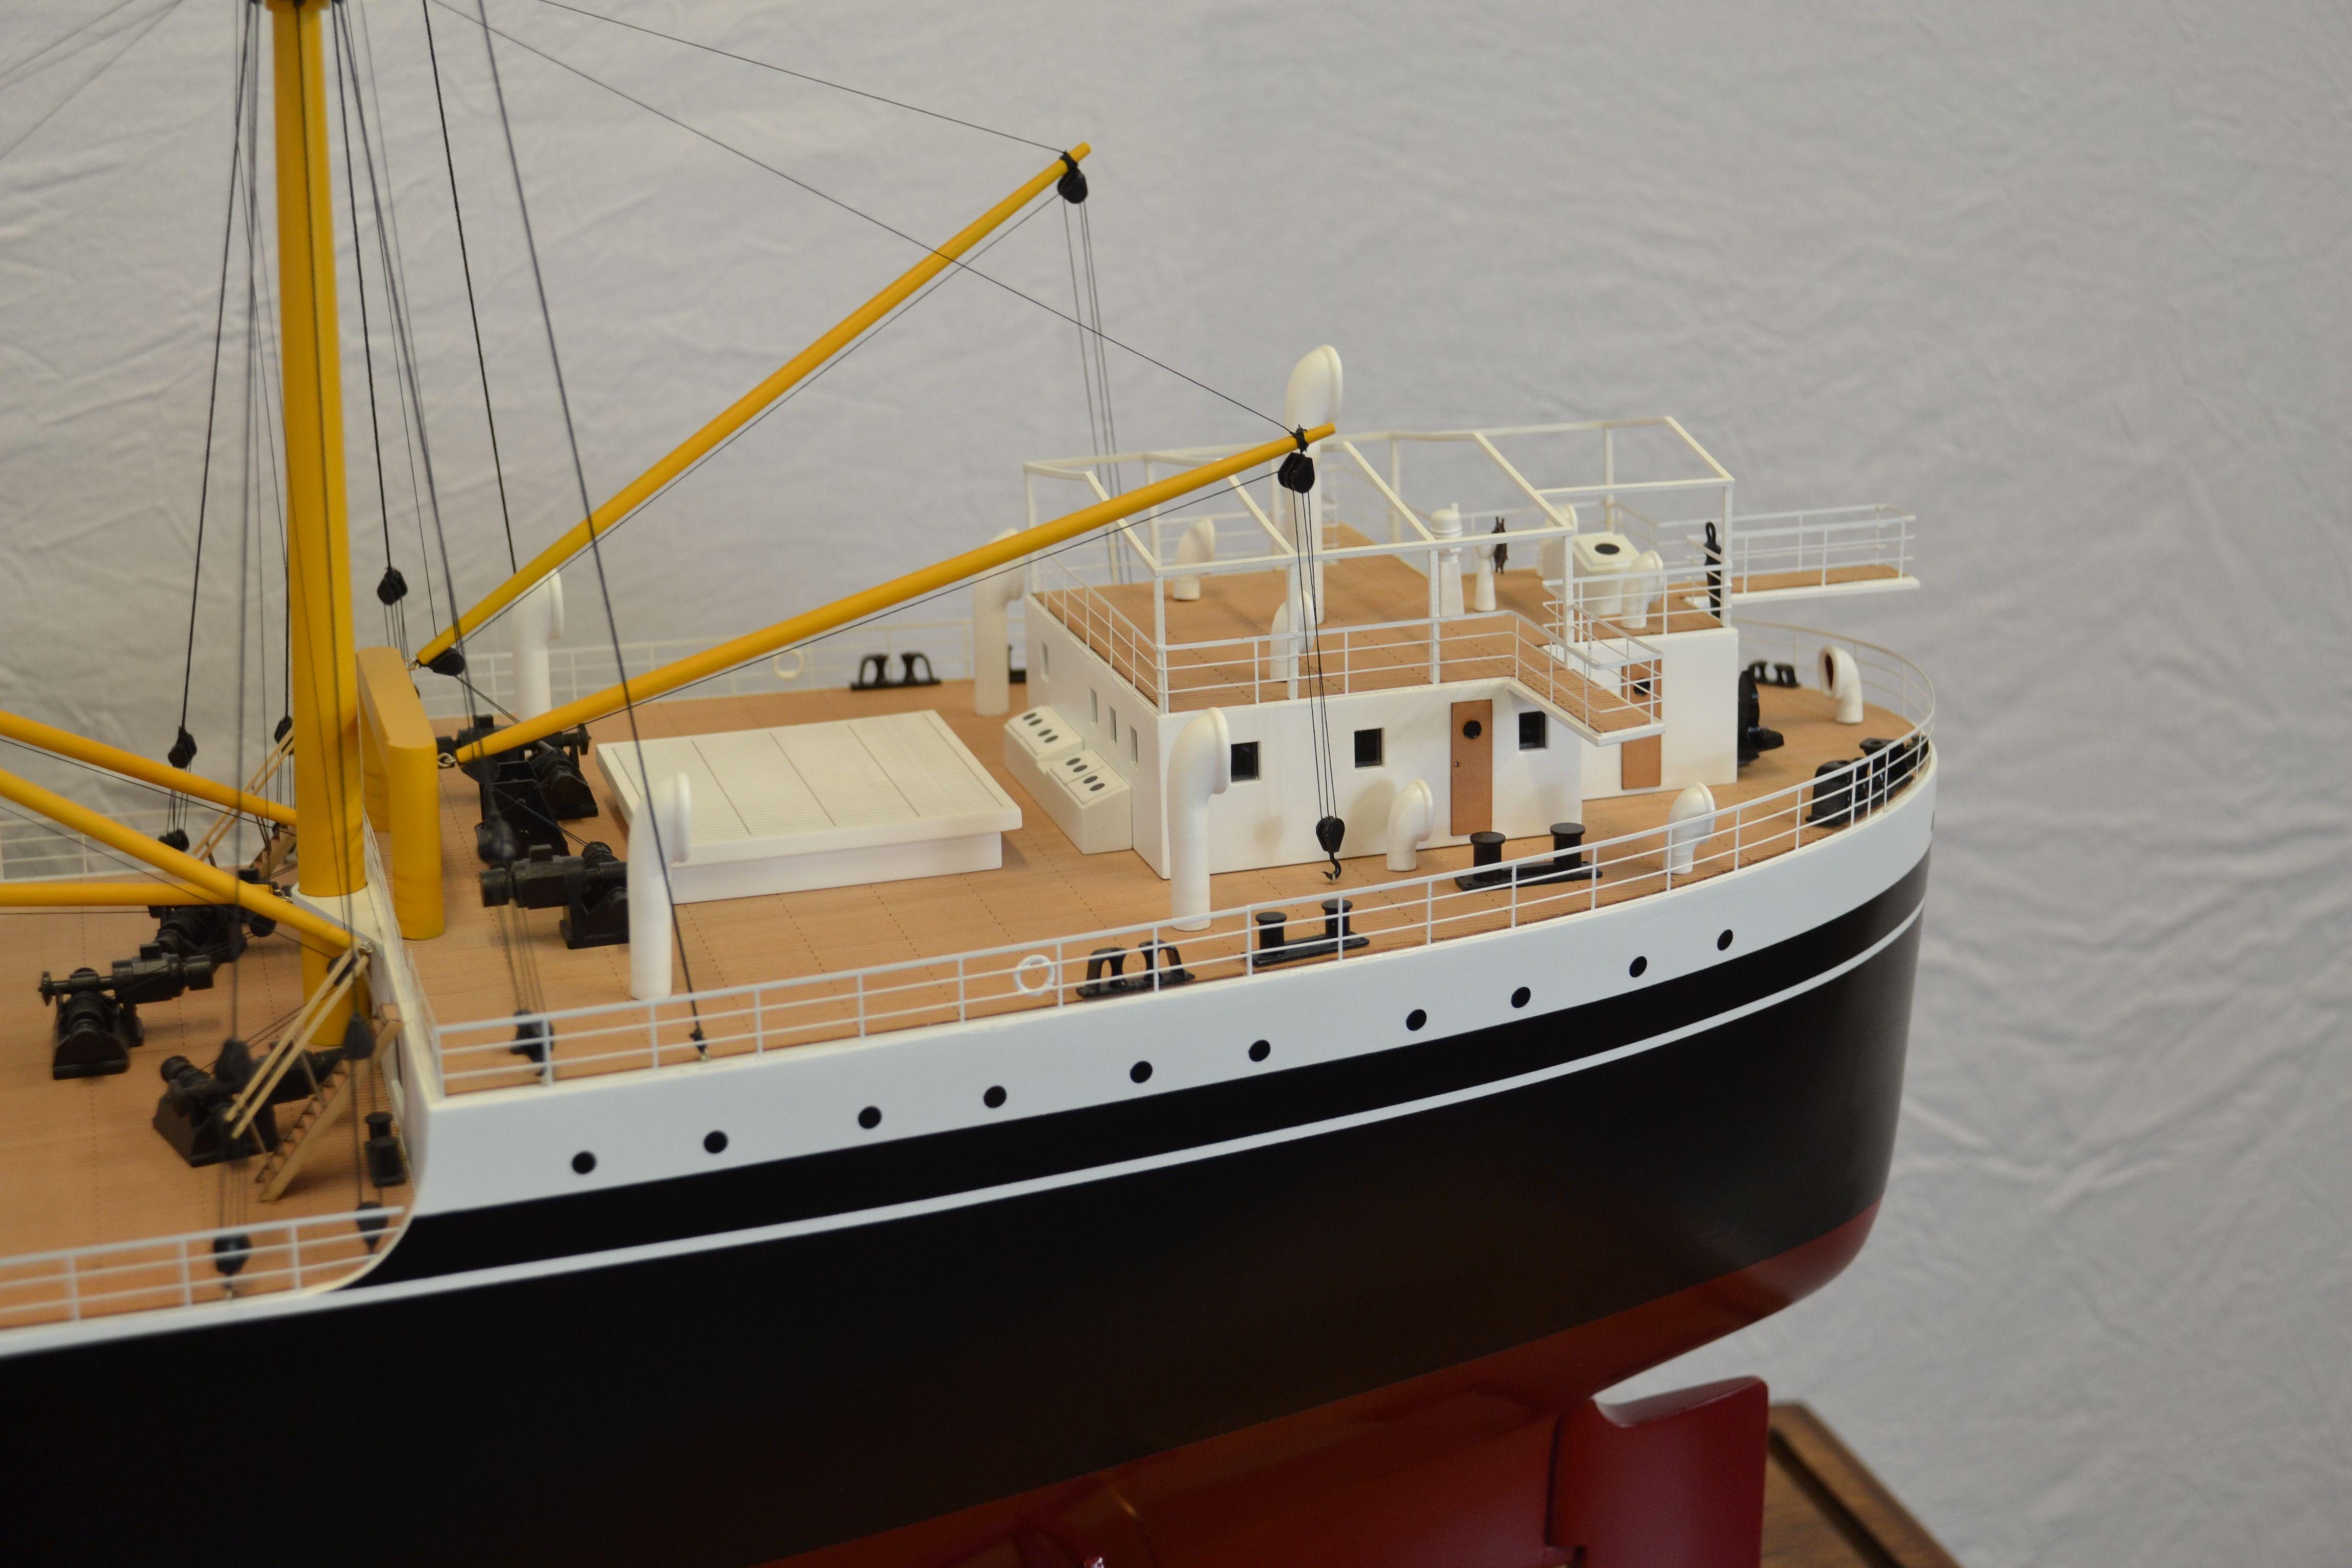 2209-12960-SS-Corinthic-Model-Ship